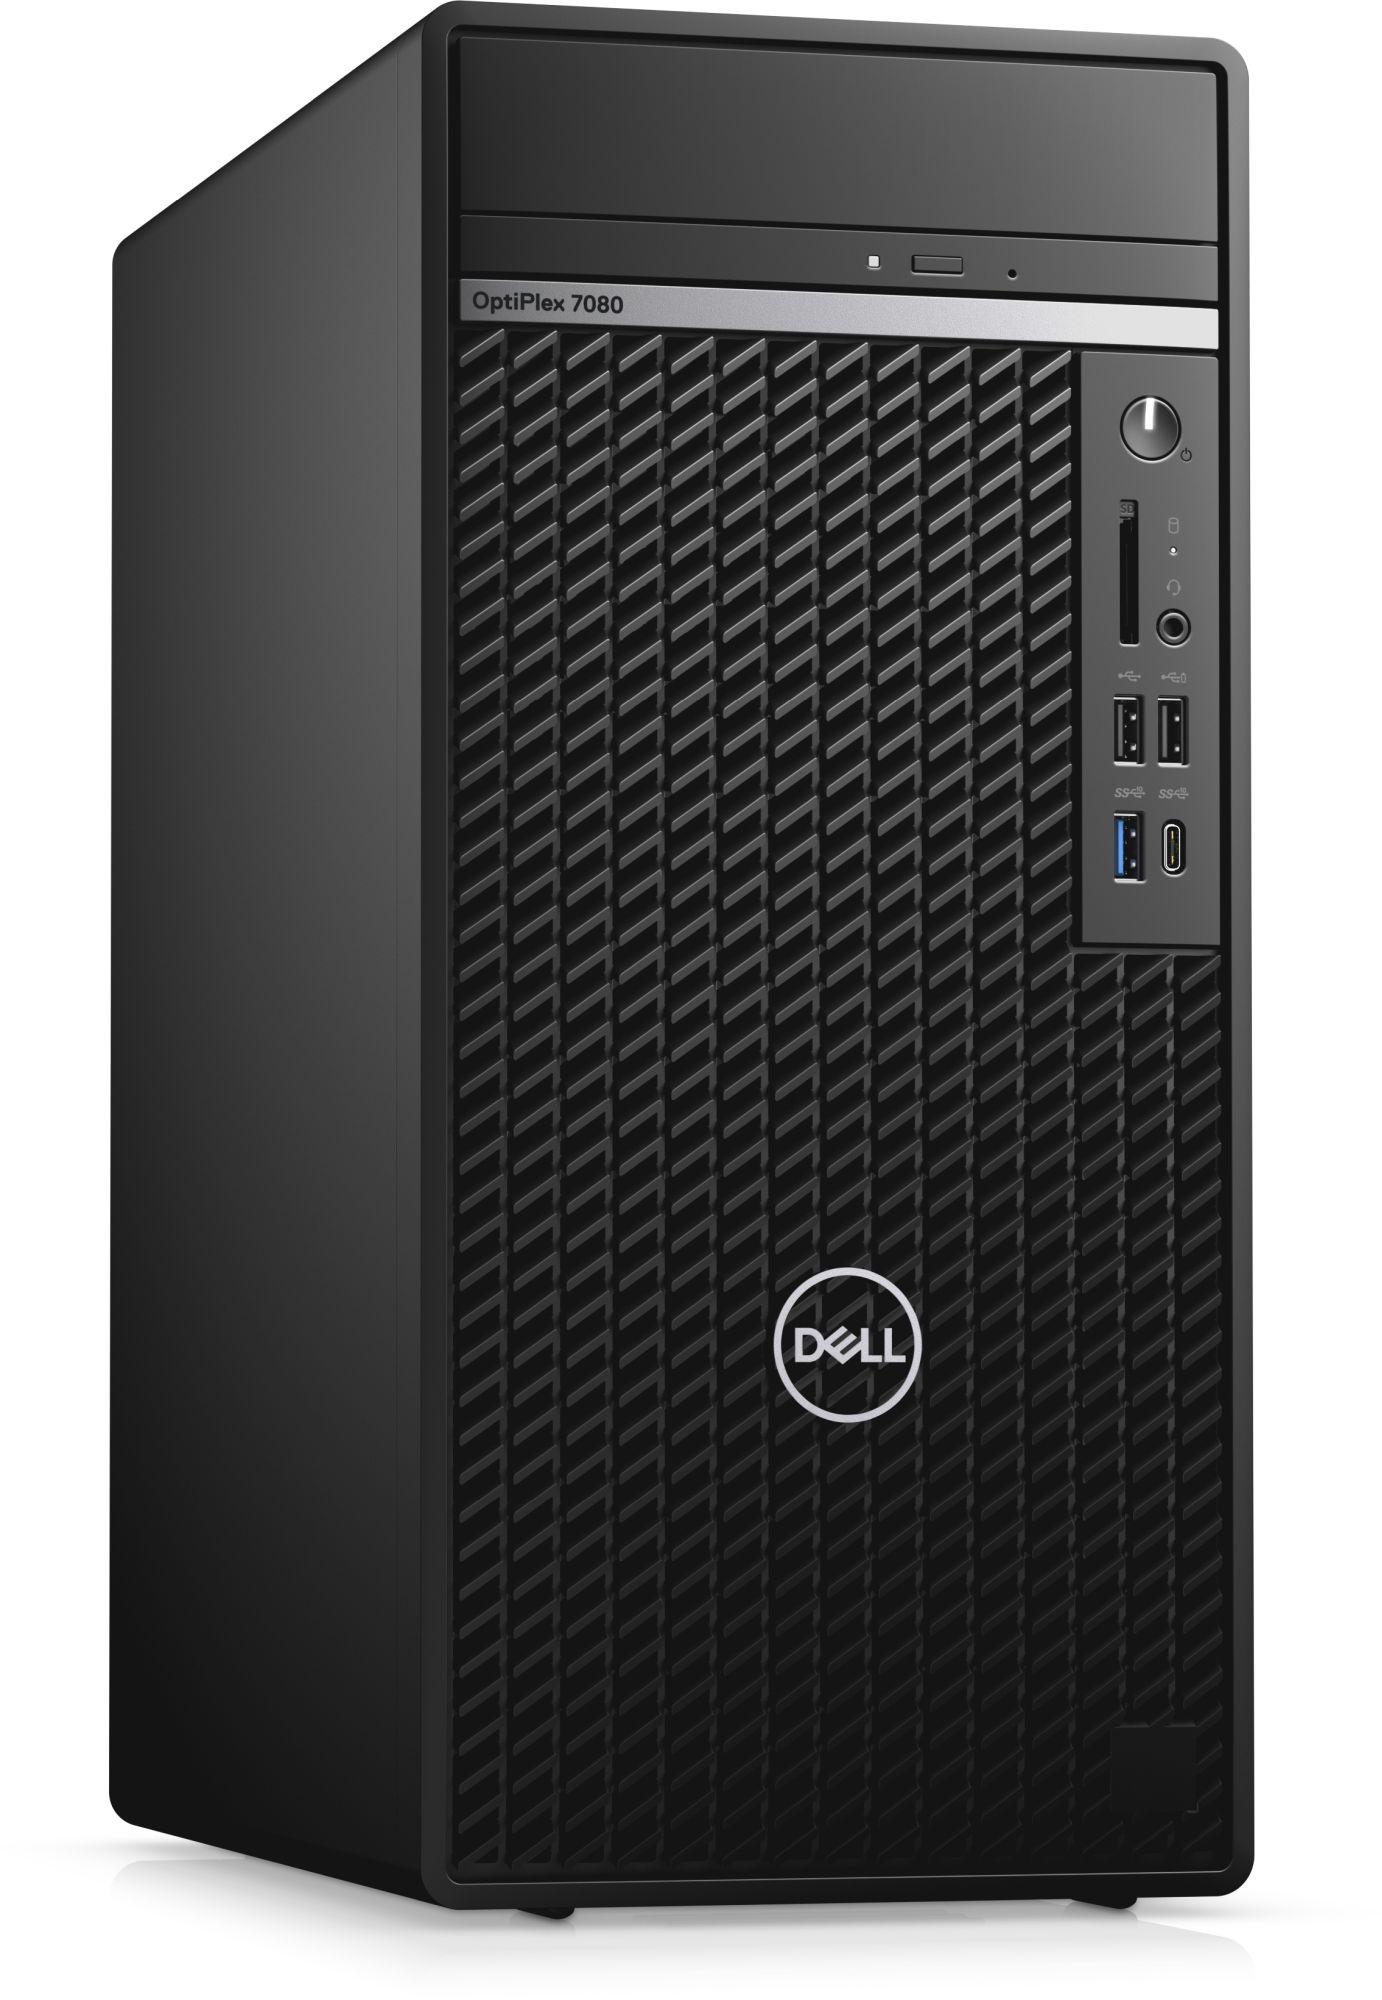 ПК Dell Optiplex 7080 MT Core i9 10900 (2.8)/16Gb/SSD1Tb/GTX1660 Super 6Gb/DVDRW/CR/Windows 10 Professional/GbitEth/WiFi/BT/360W/клавиатура/мышь/черный